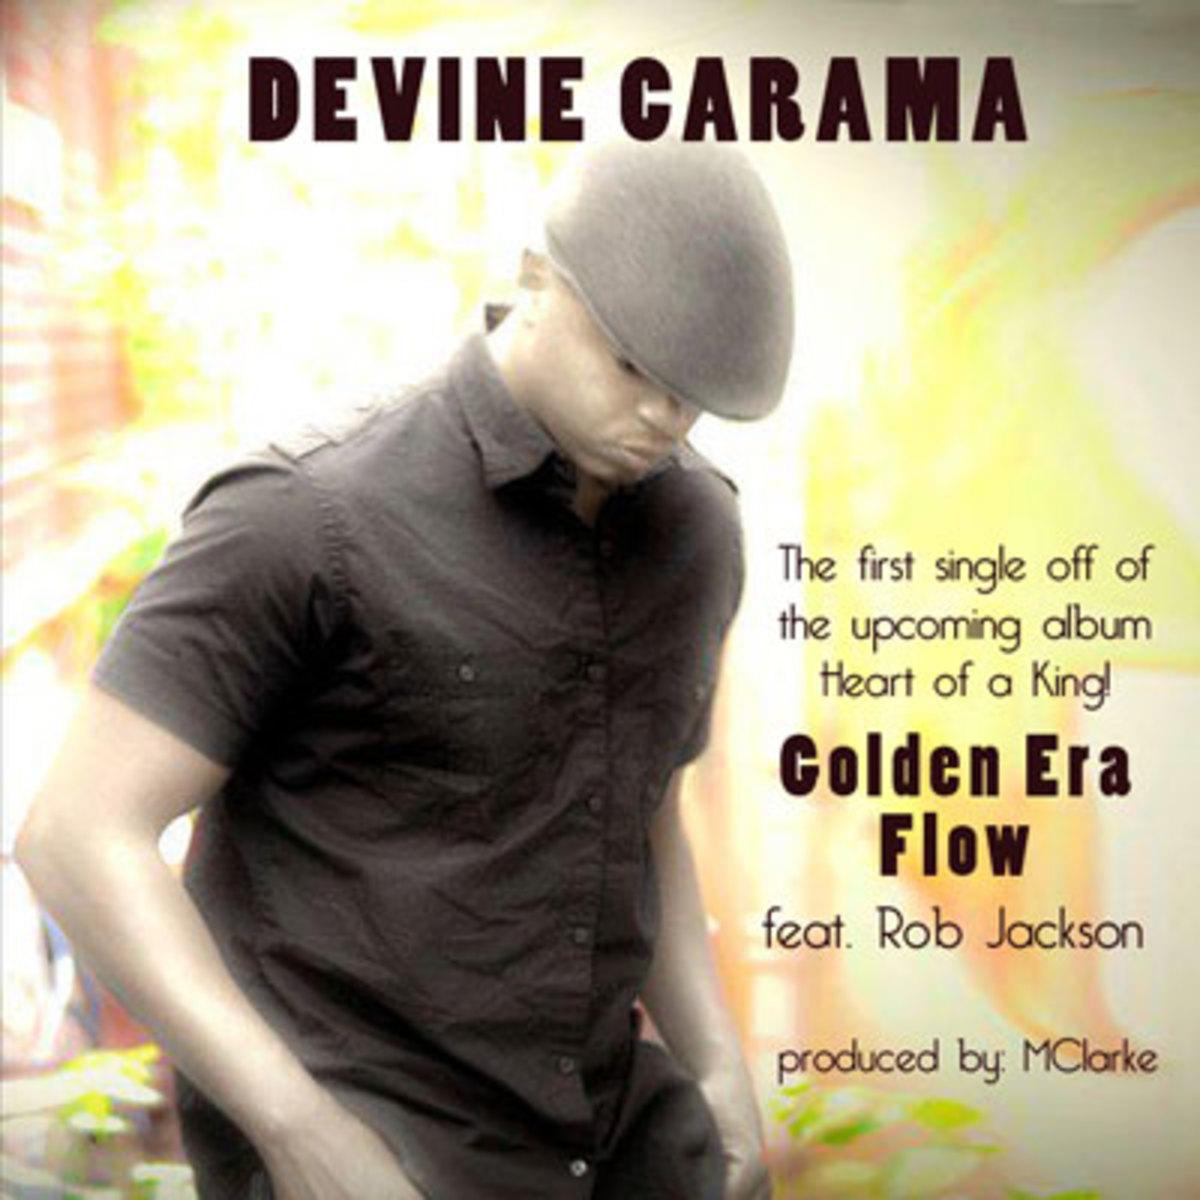 devincar-goldeneraflow.jpg